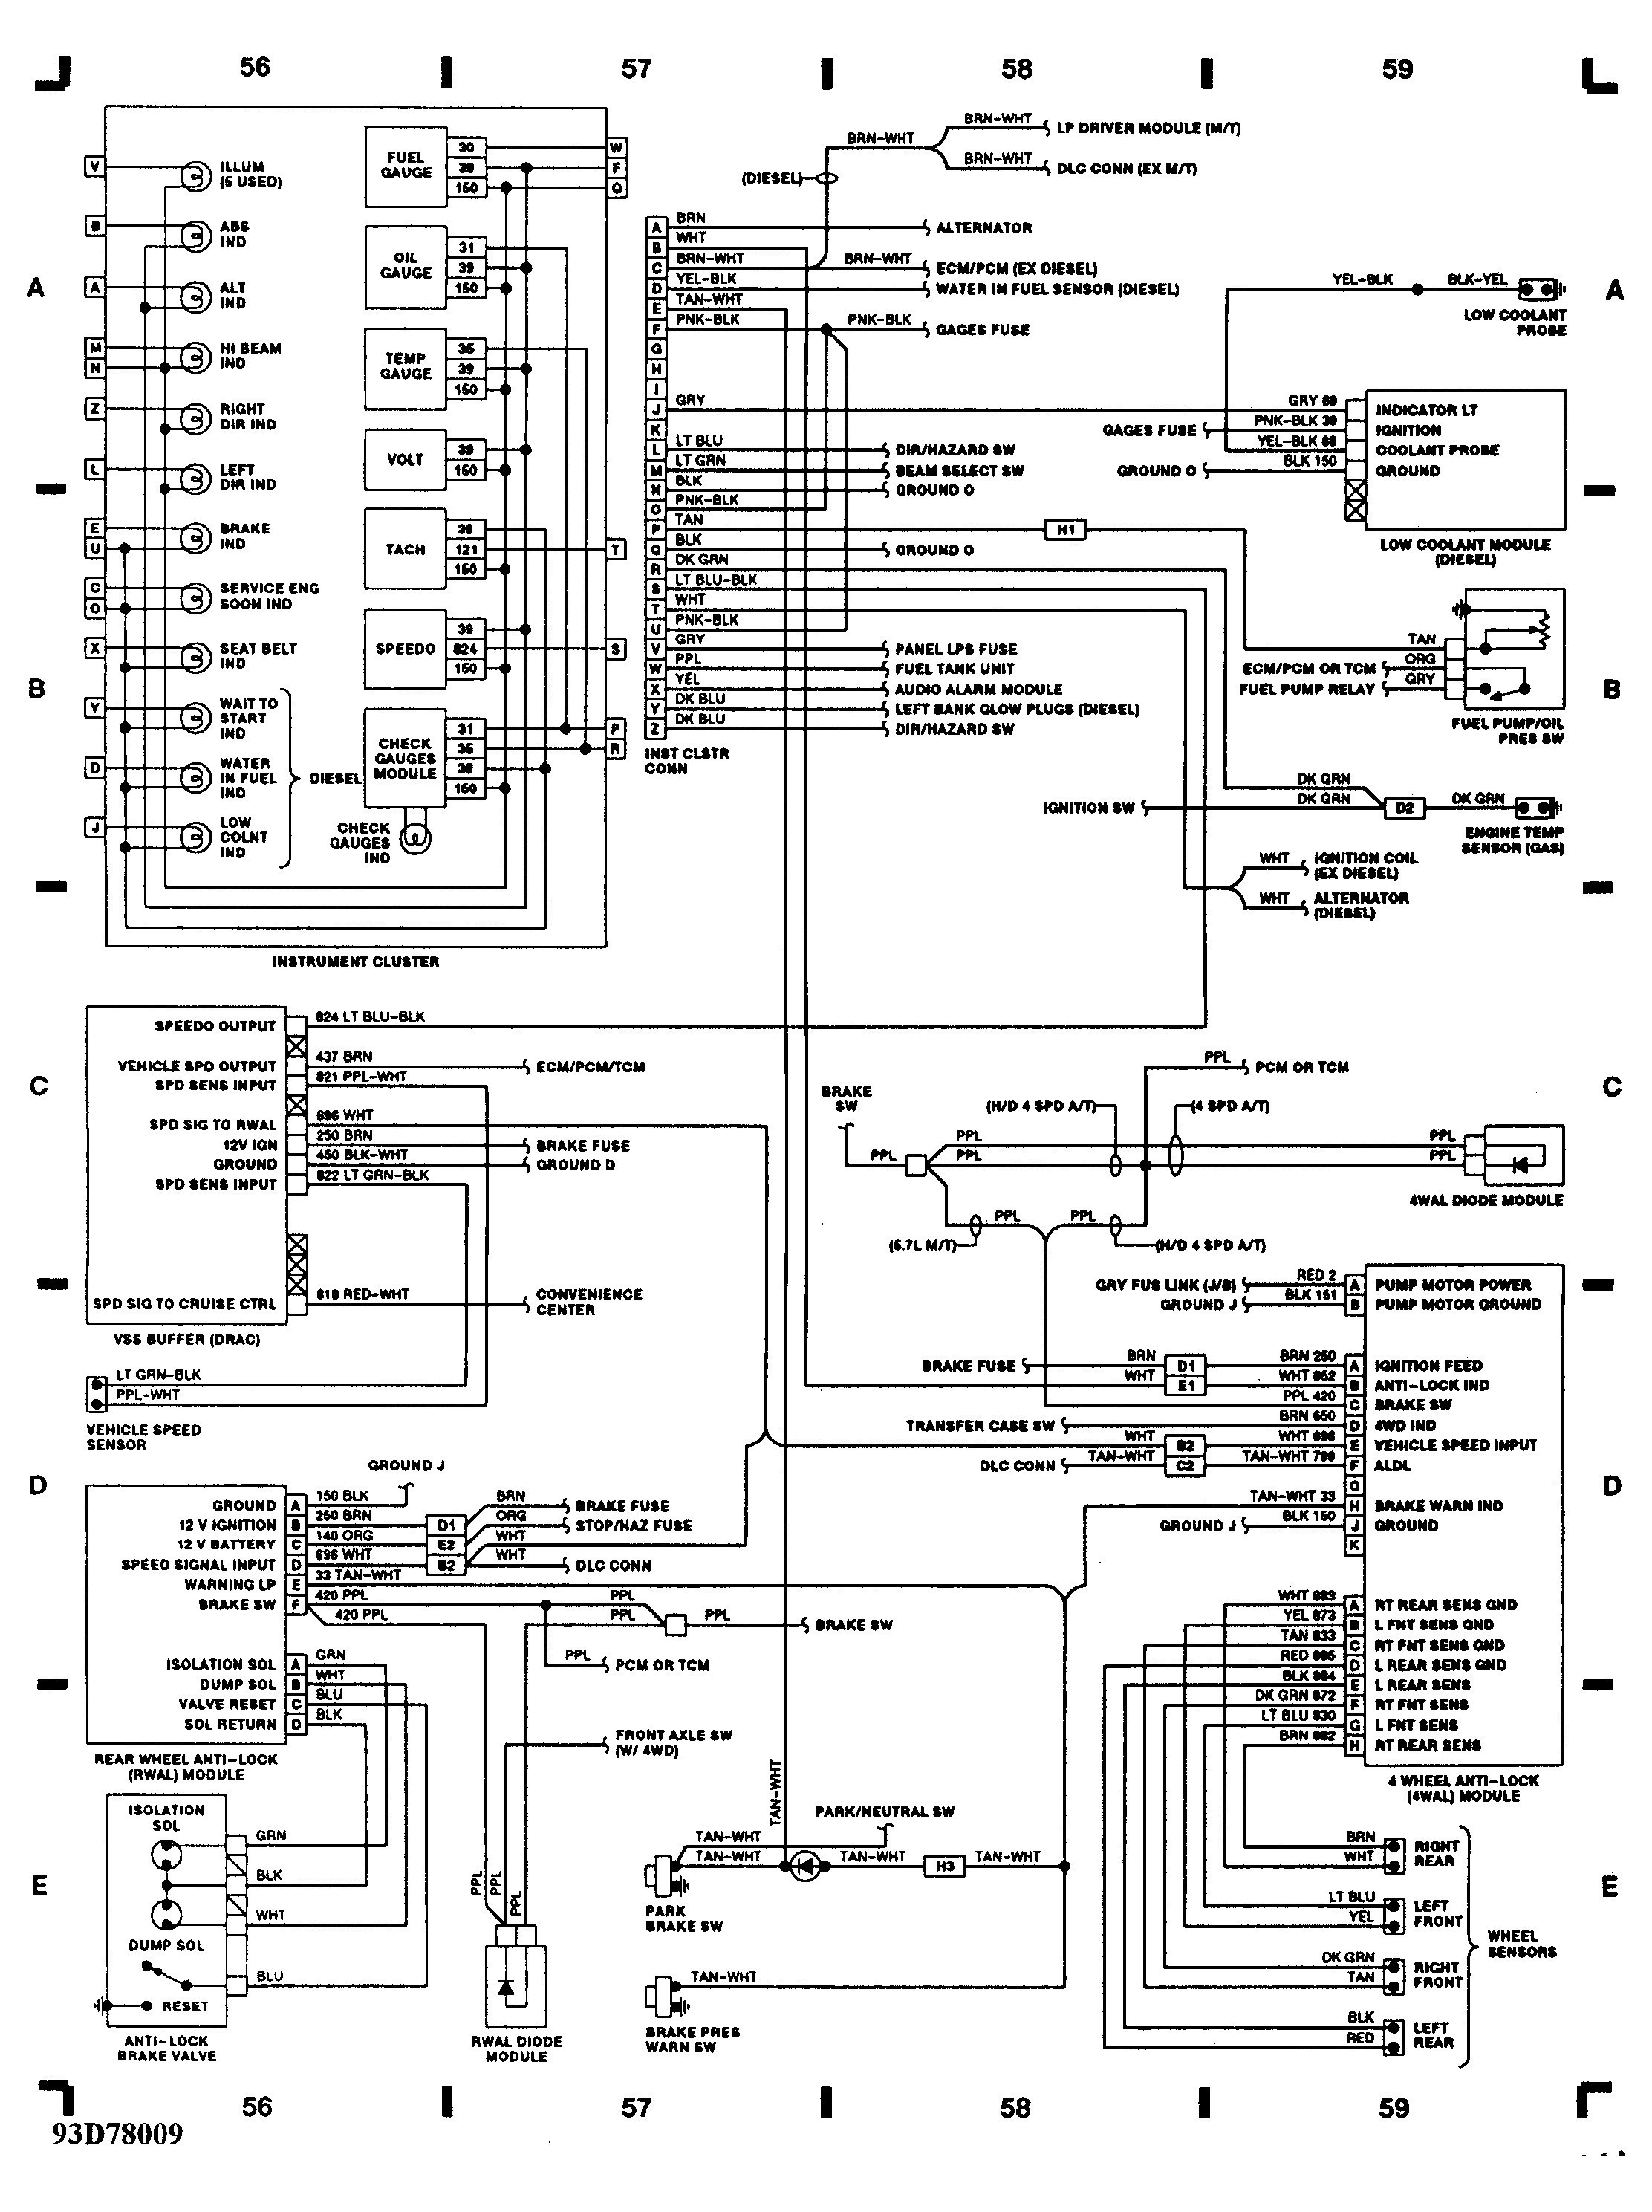 2004 Trailblazer Engine Diagram 95 7 3l Engine Diagram Wiring Diagram Used Of 2004 Trailblazer Engine Diagram